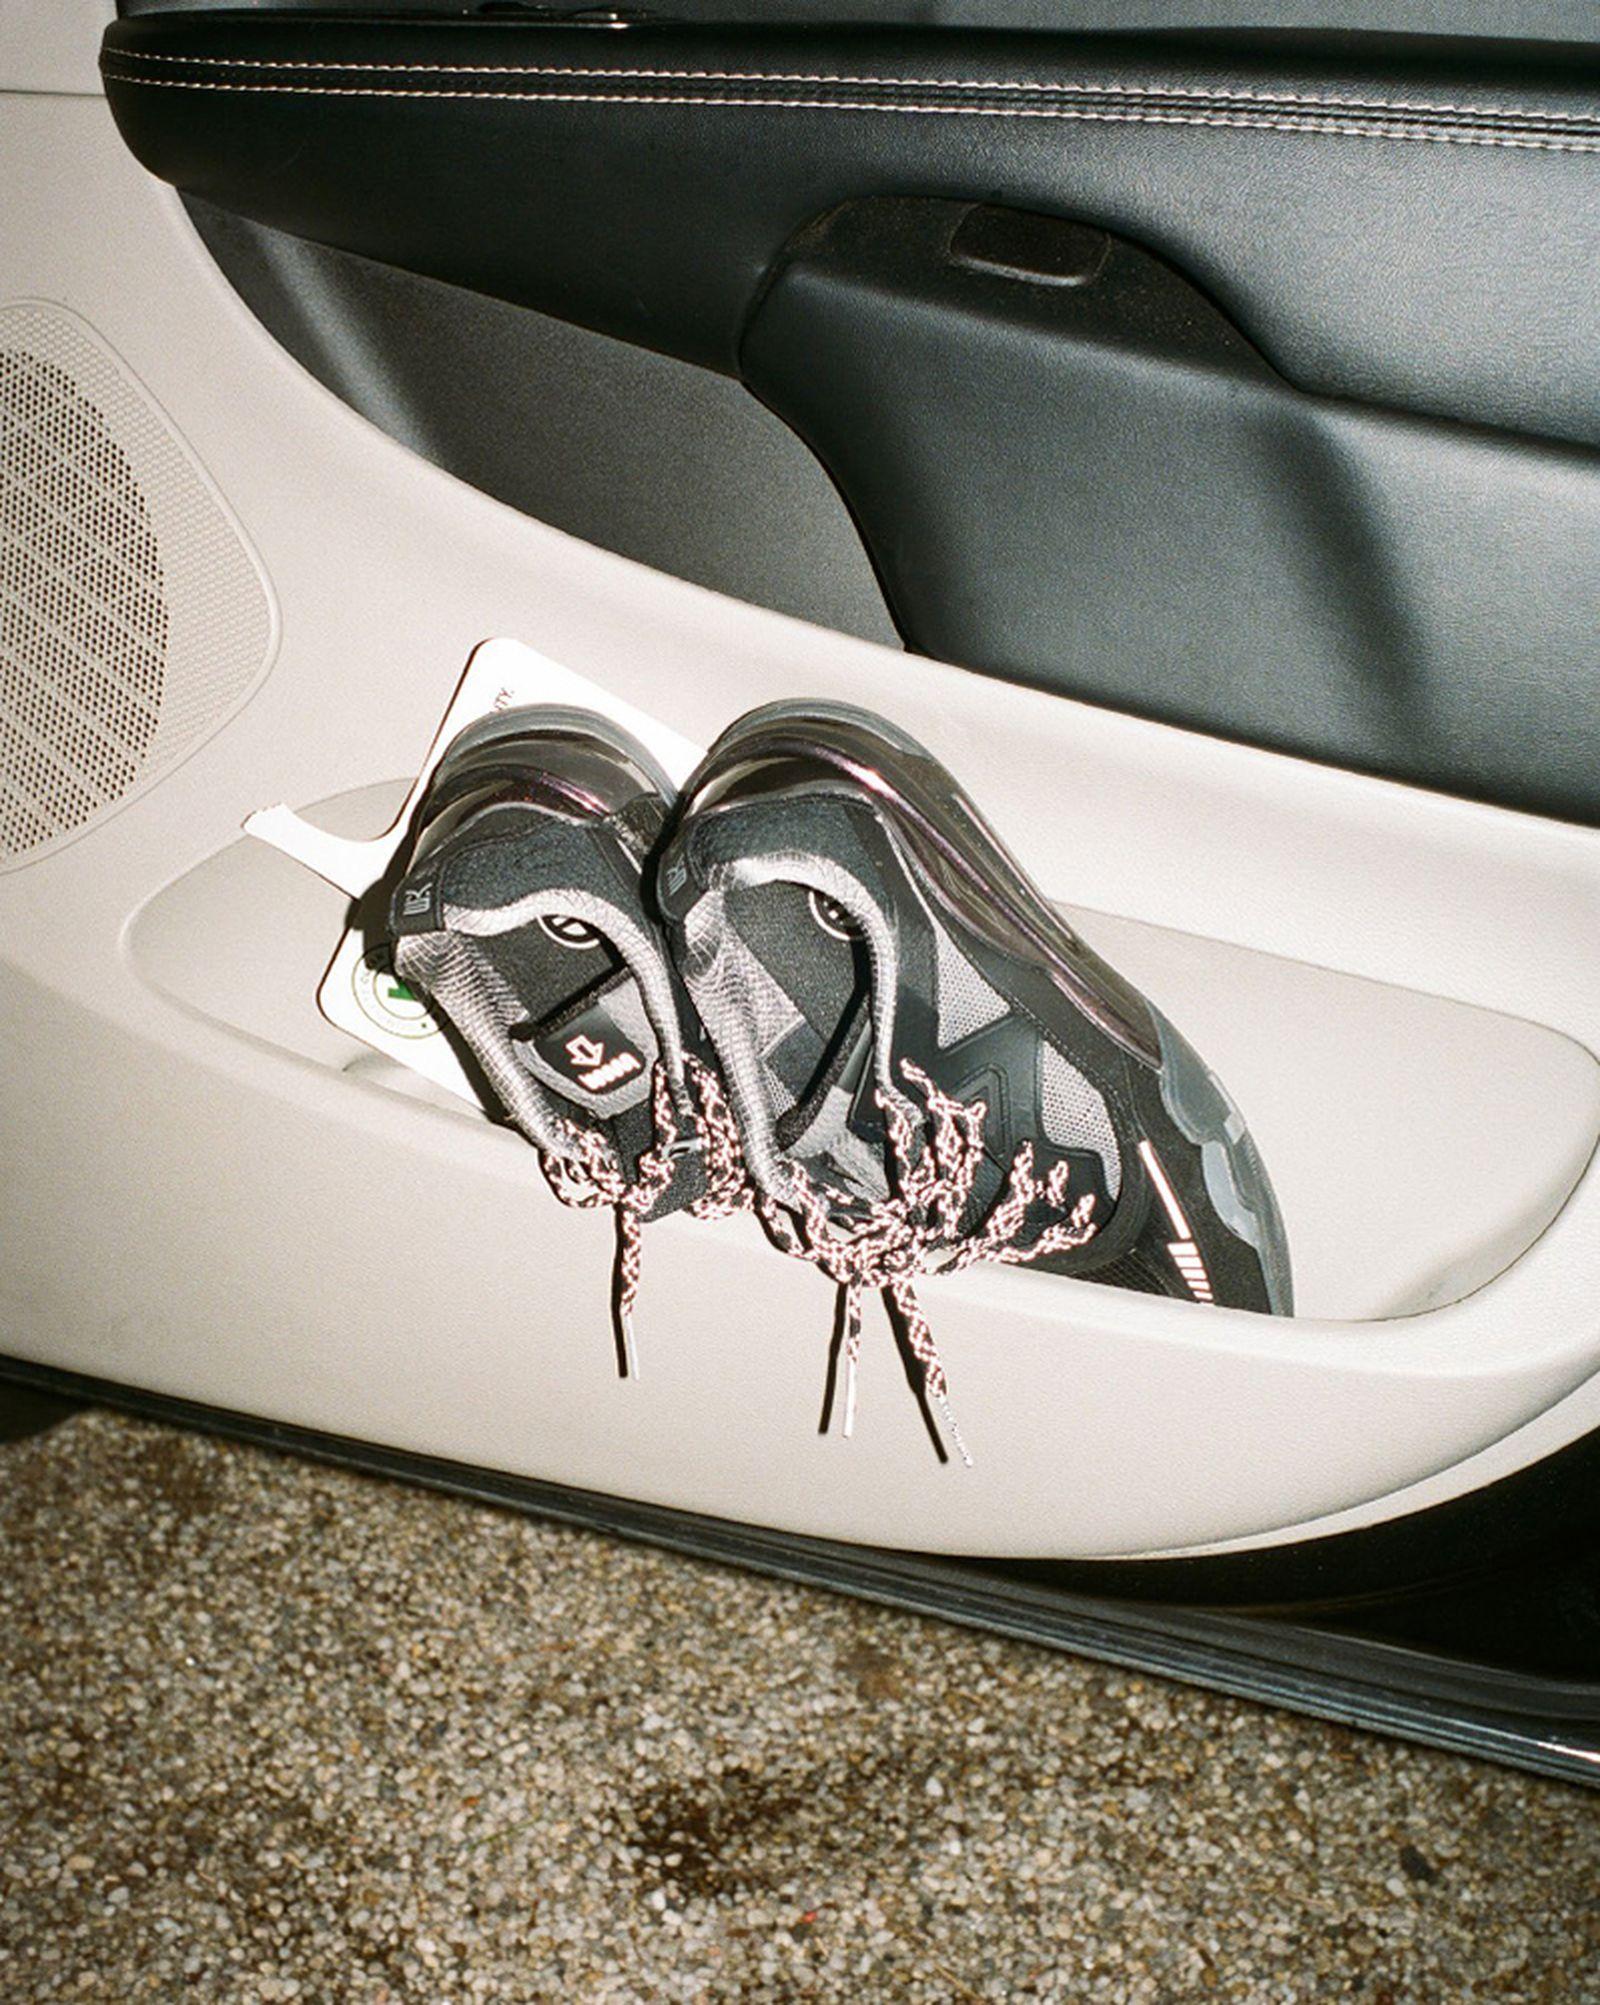 li-ning-skate-collection-erik-ellington-release-date-price-09